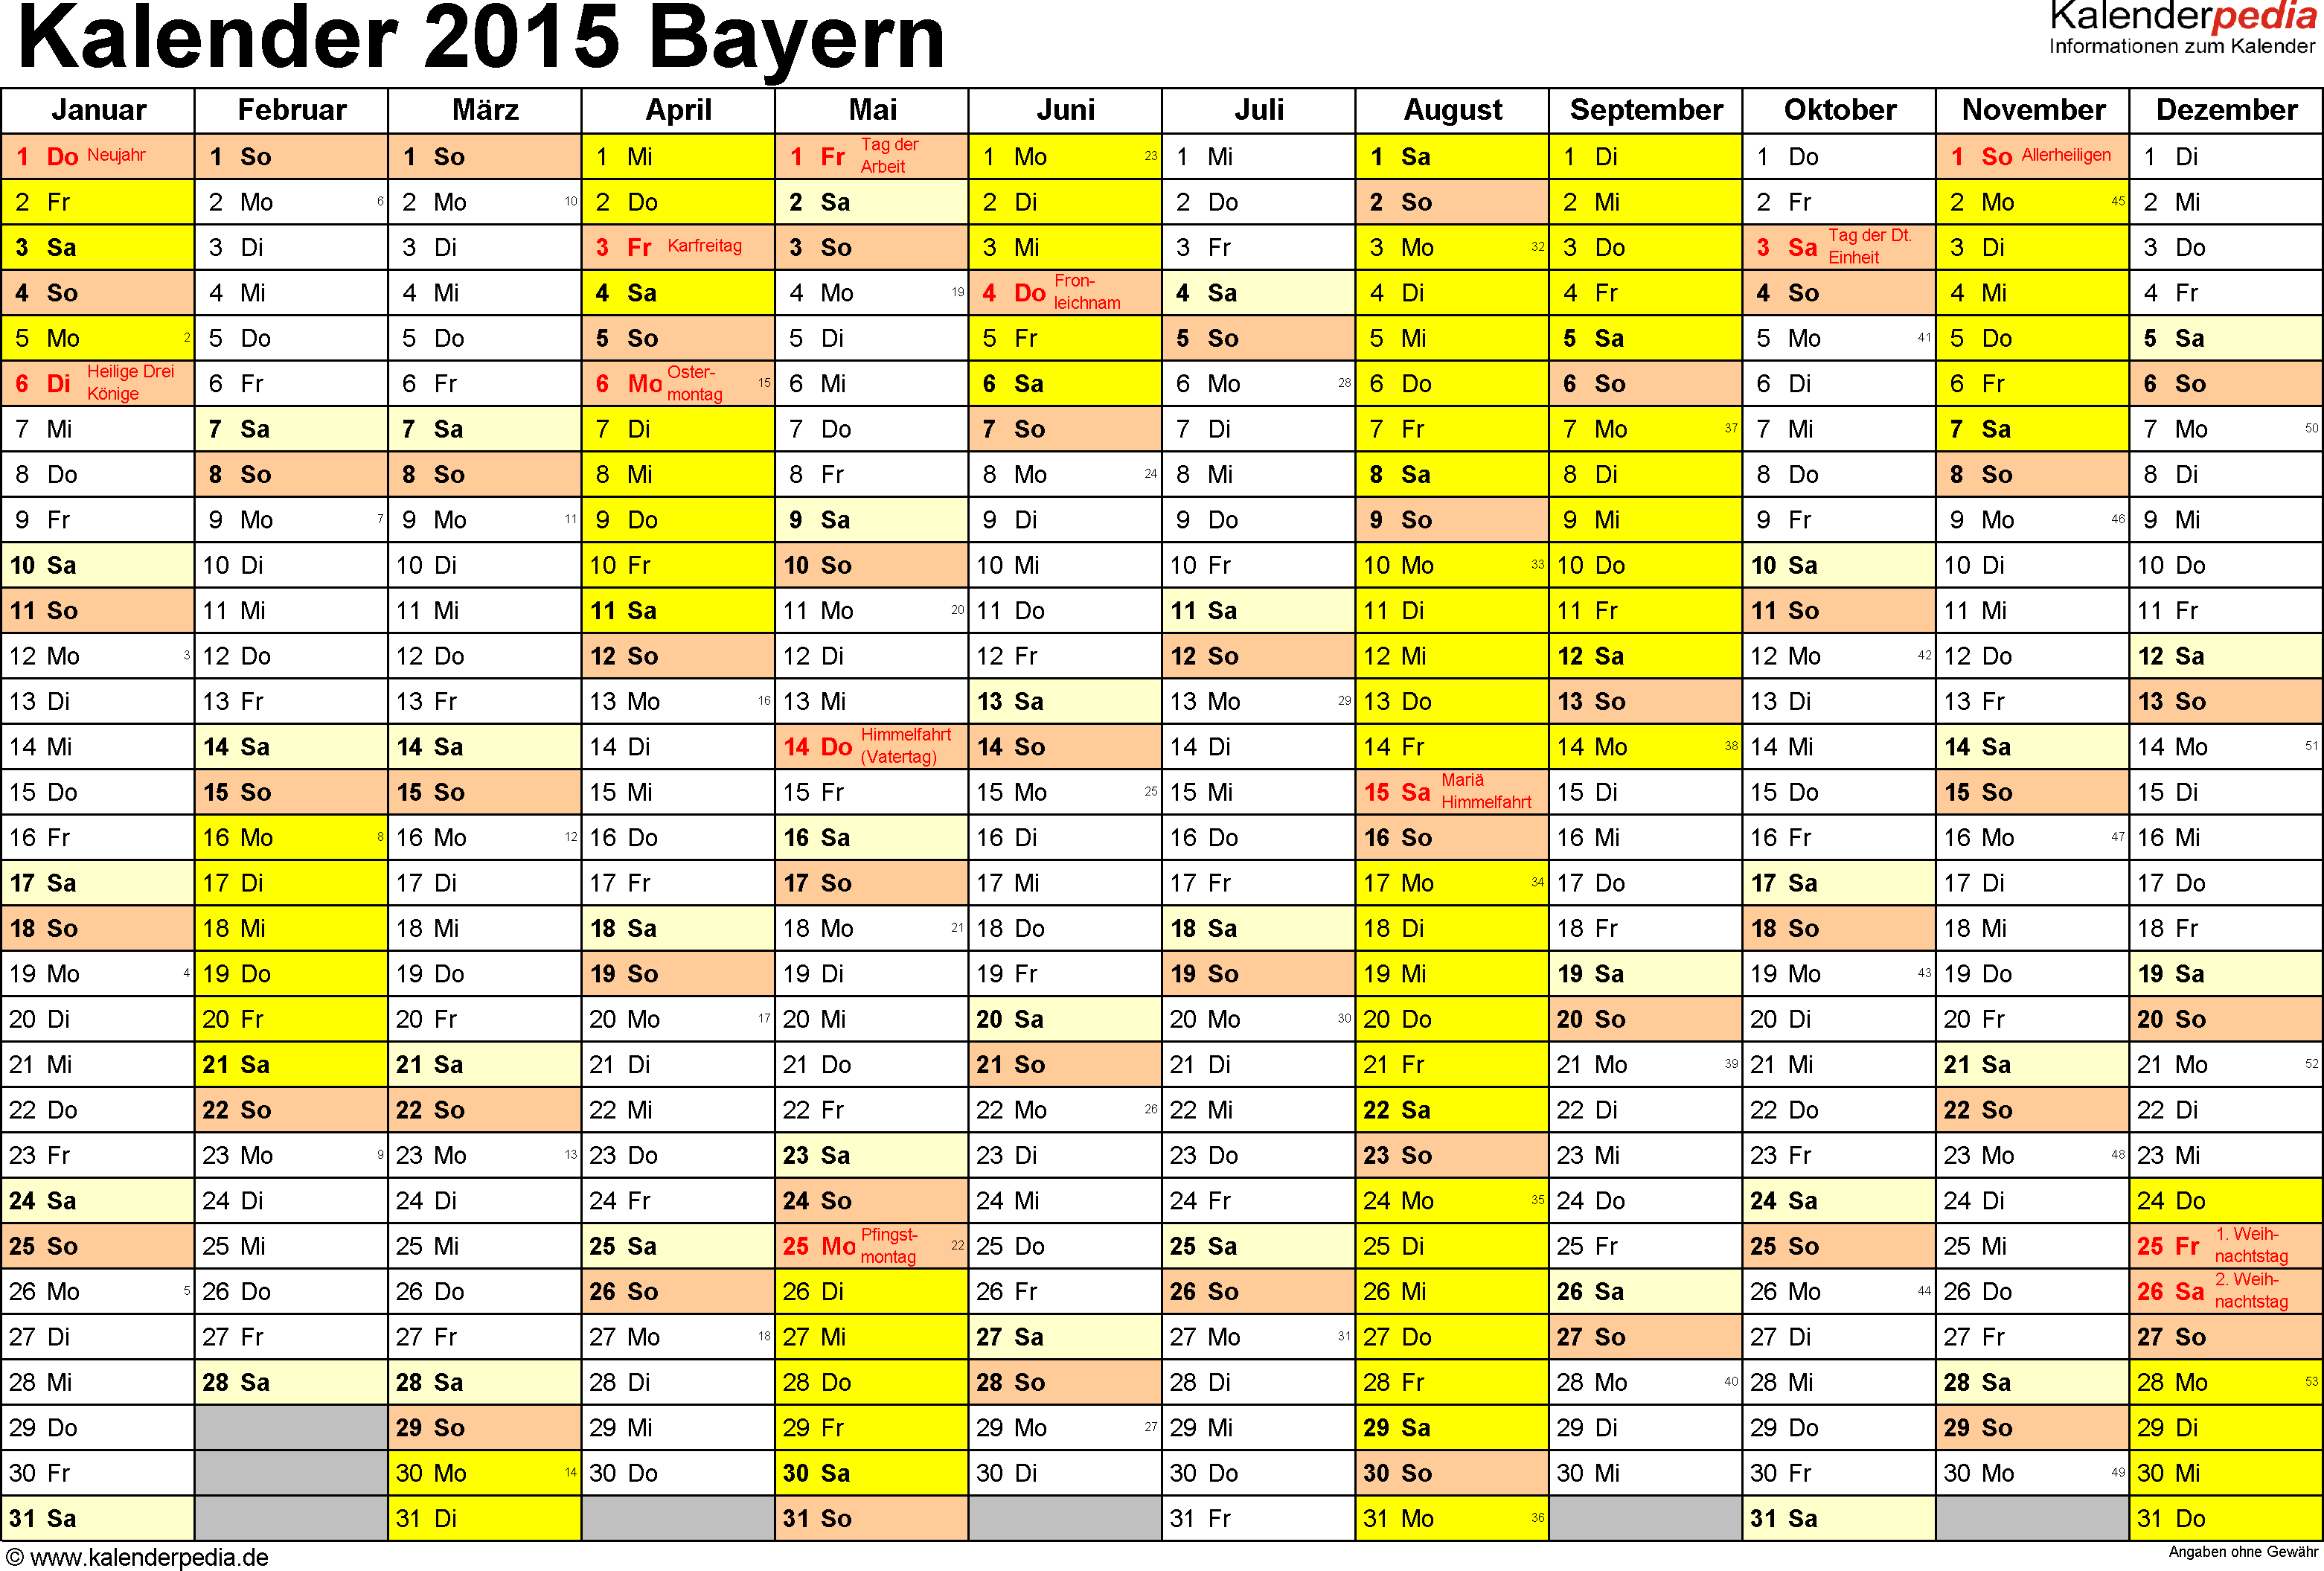 Kalender 2015 Bayern